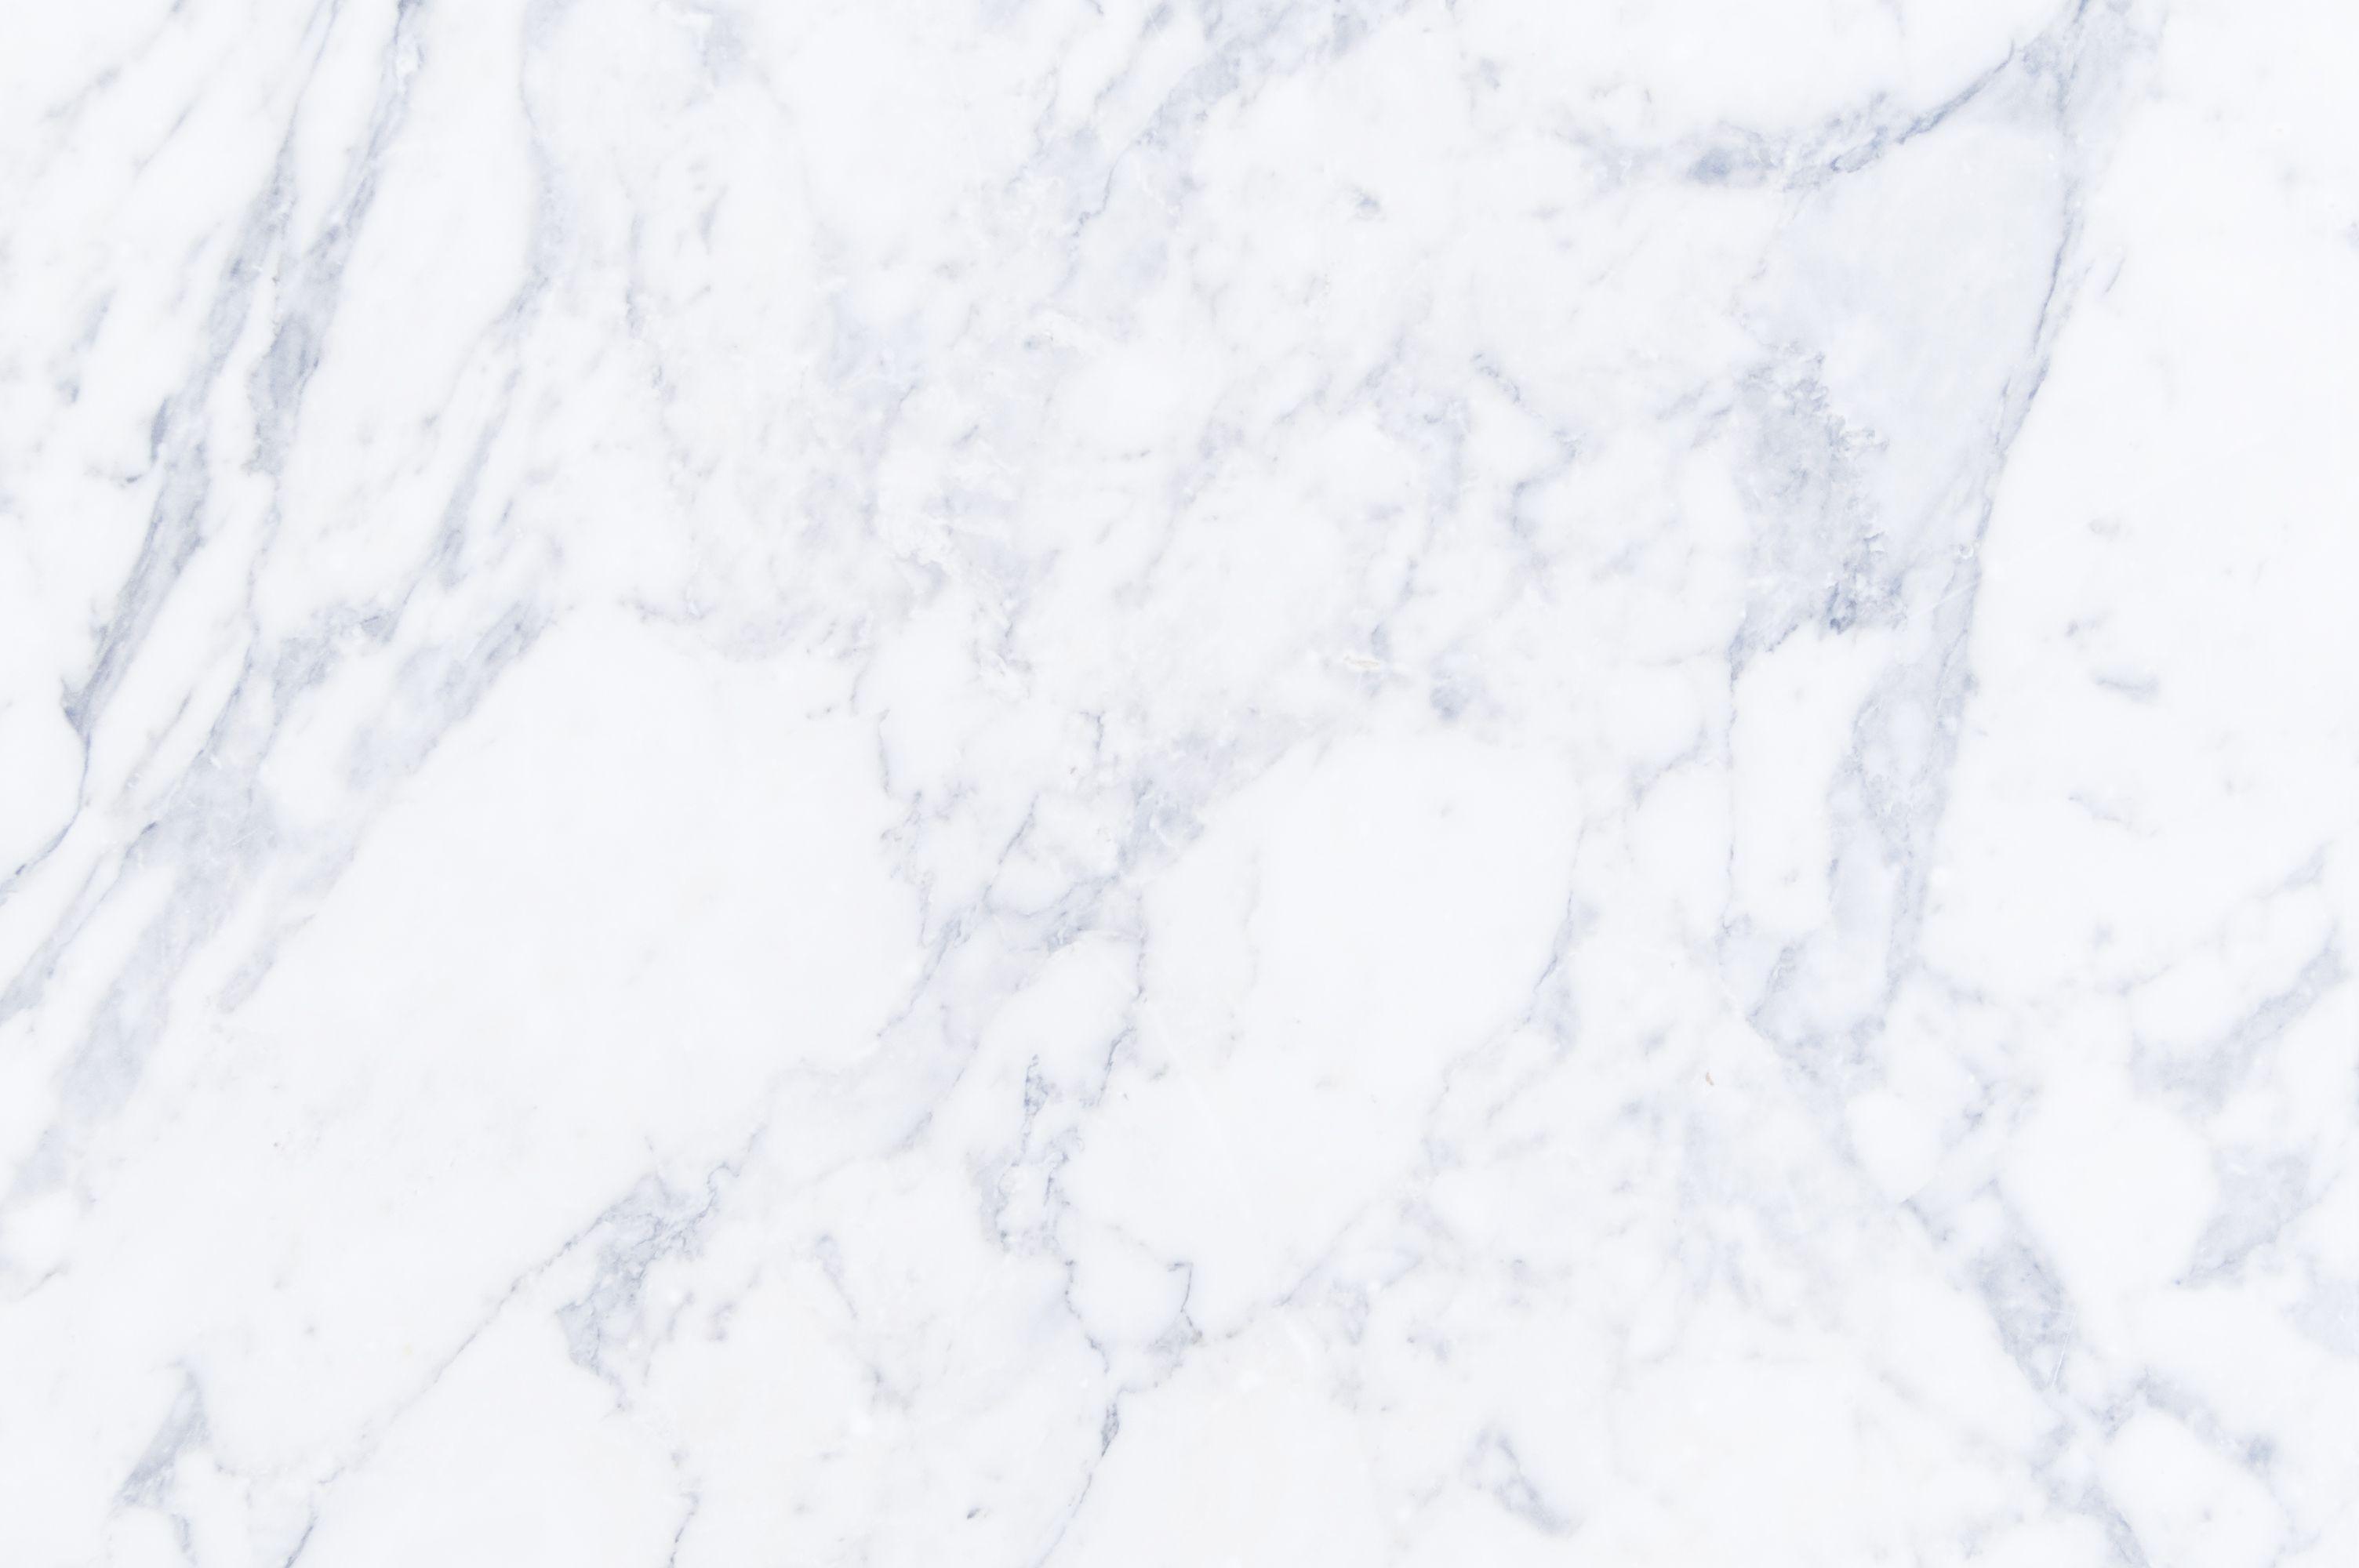 White Marble Desktop Wallpapers Top Free White Marble Desktop Backgrounds Wallpaperaccess